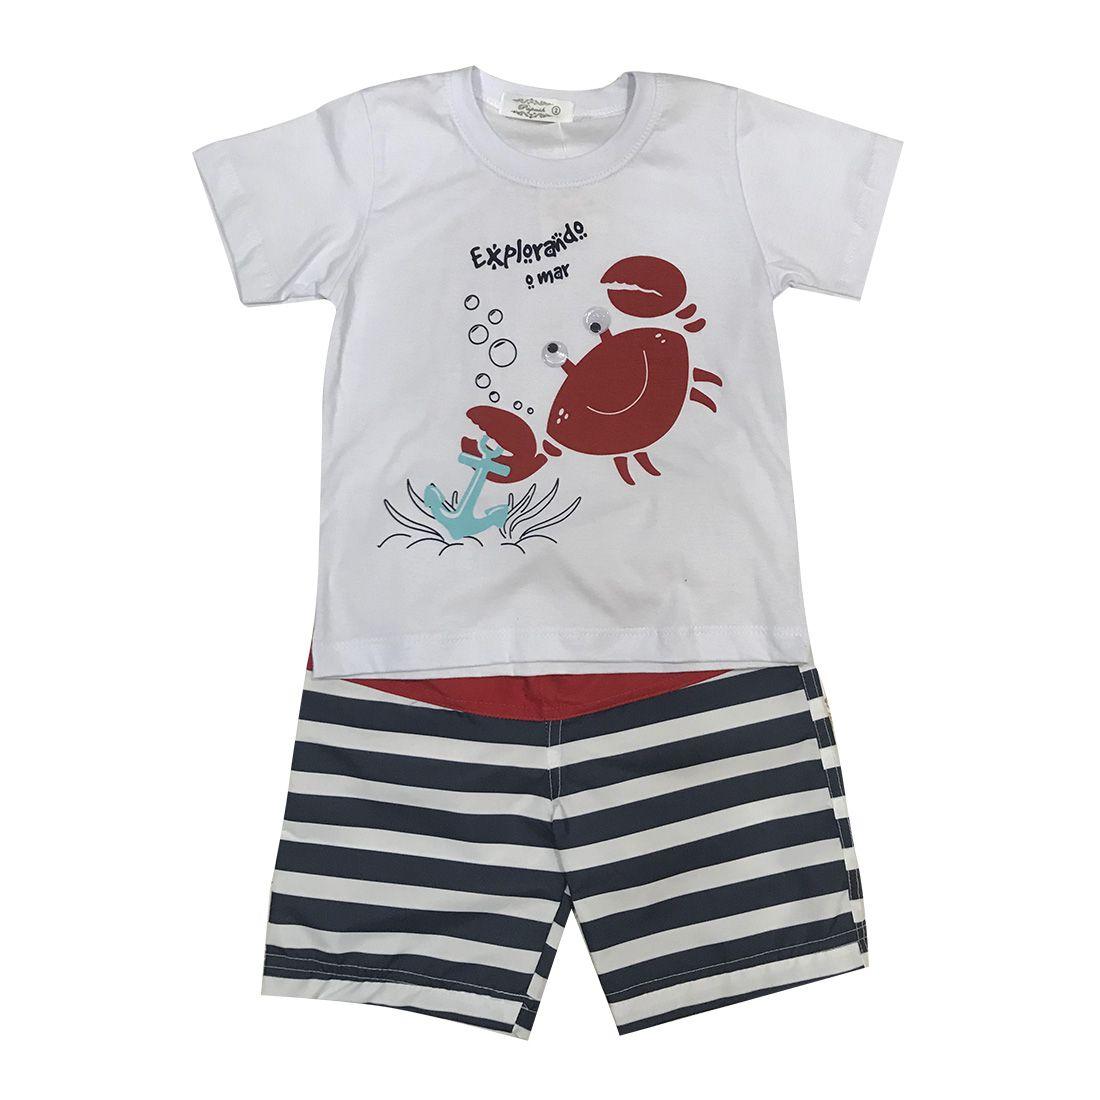 Conjunto Camiseta E Shorts - Explorando O Mar